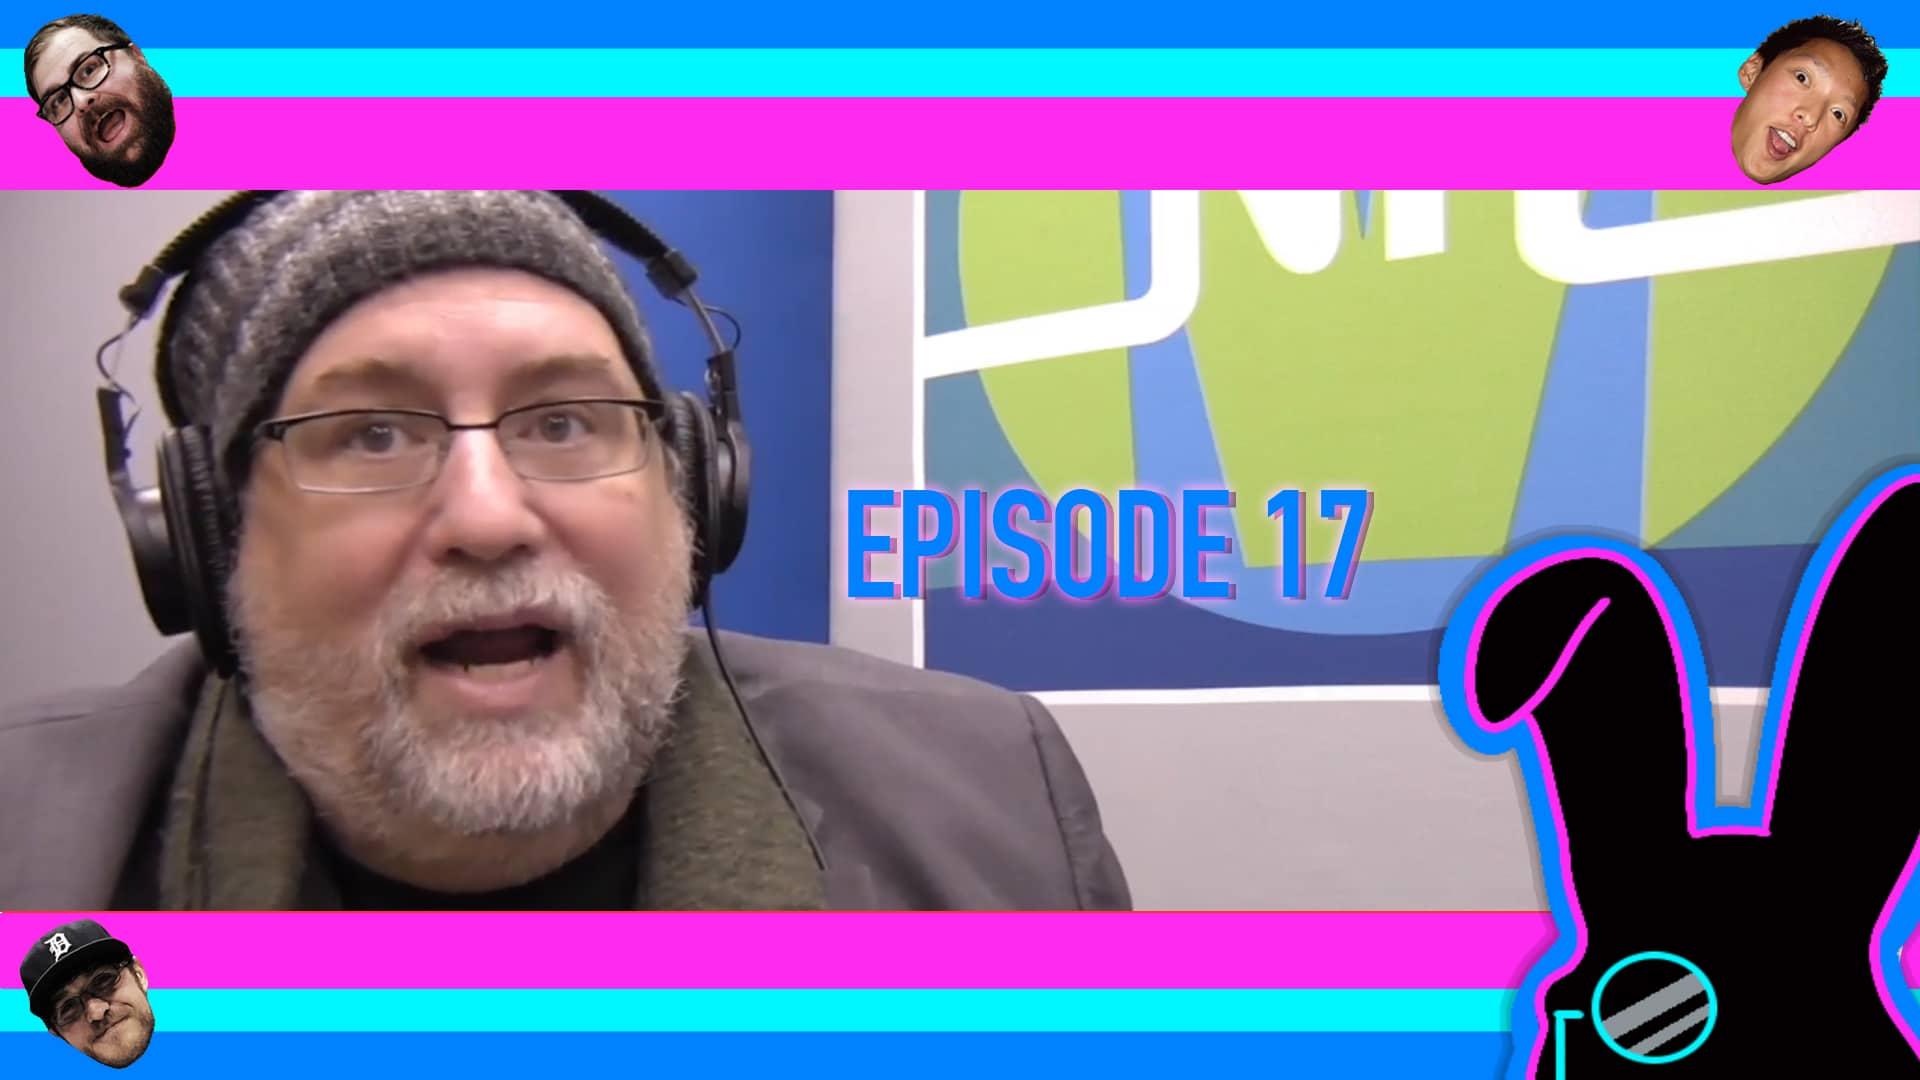 Geektainment Weekly - Episode 17